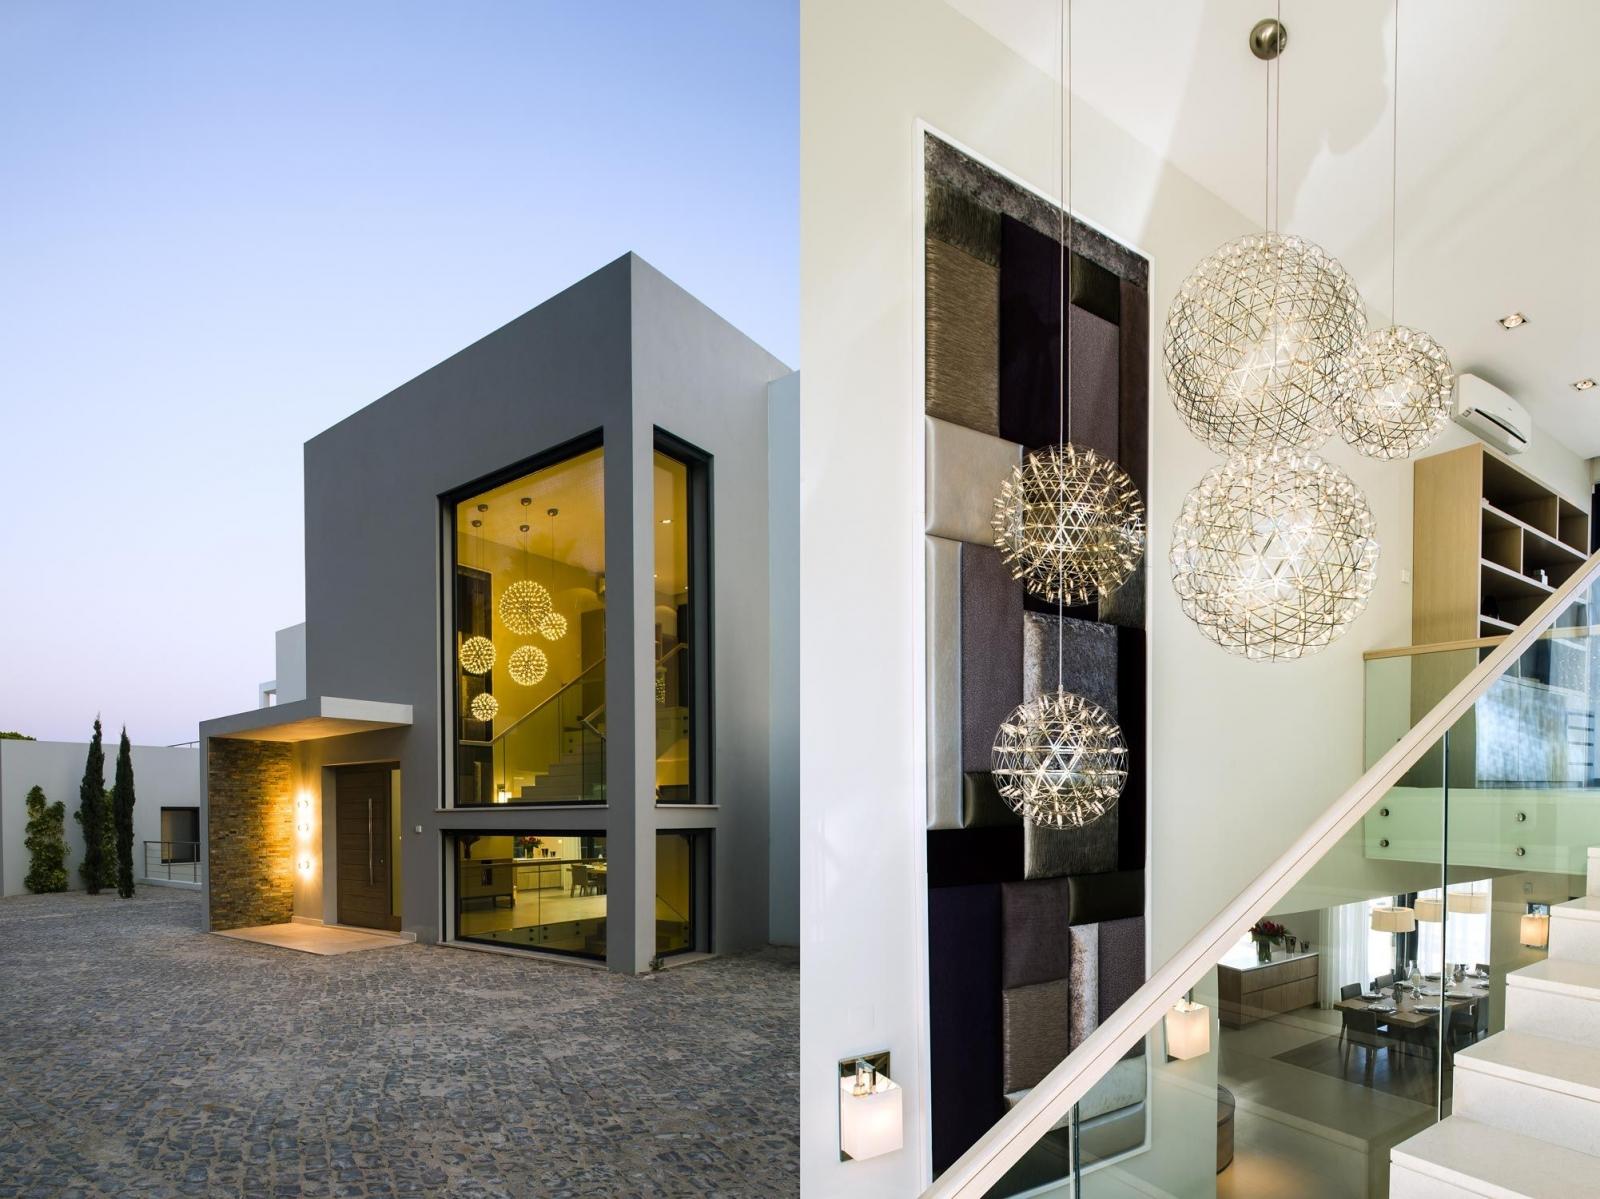 Raimond Hanglamp Moooi Design Led Verlichting